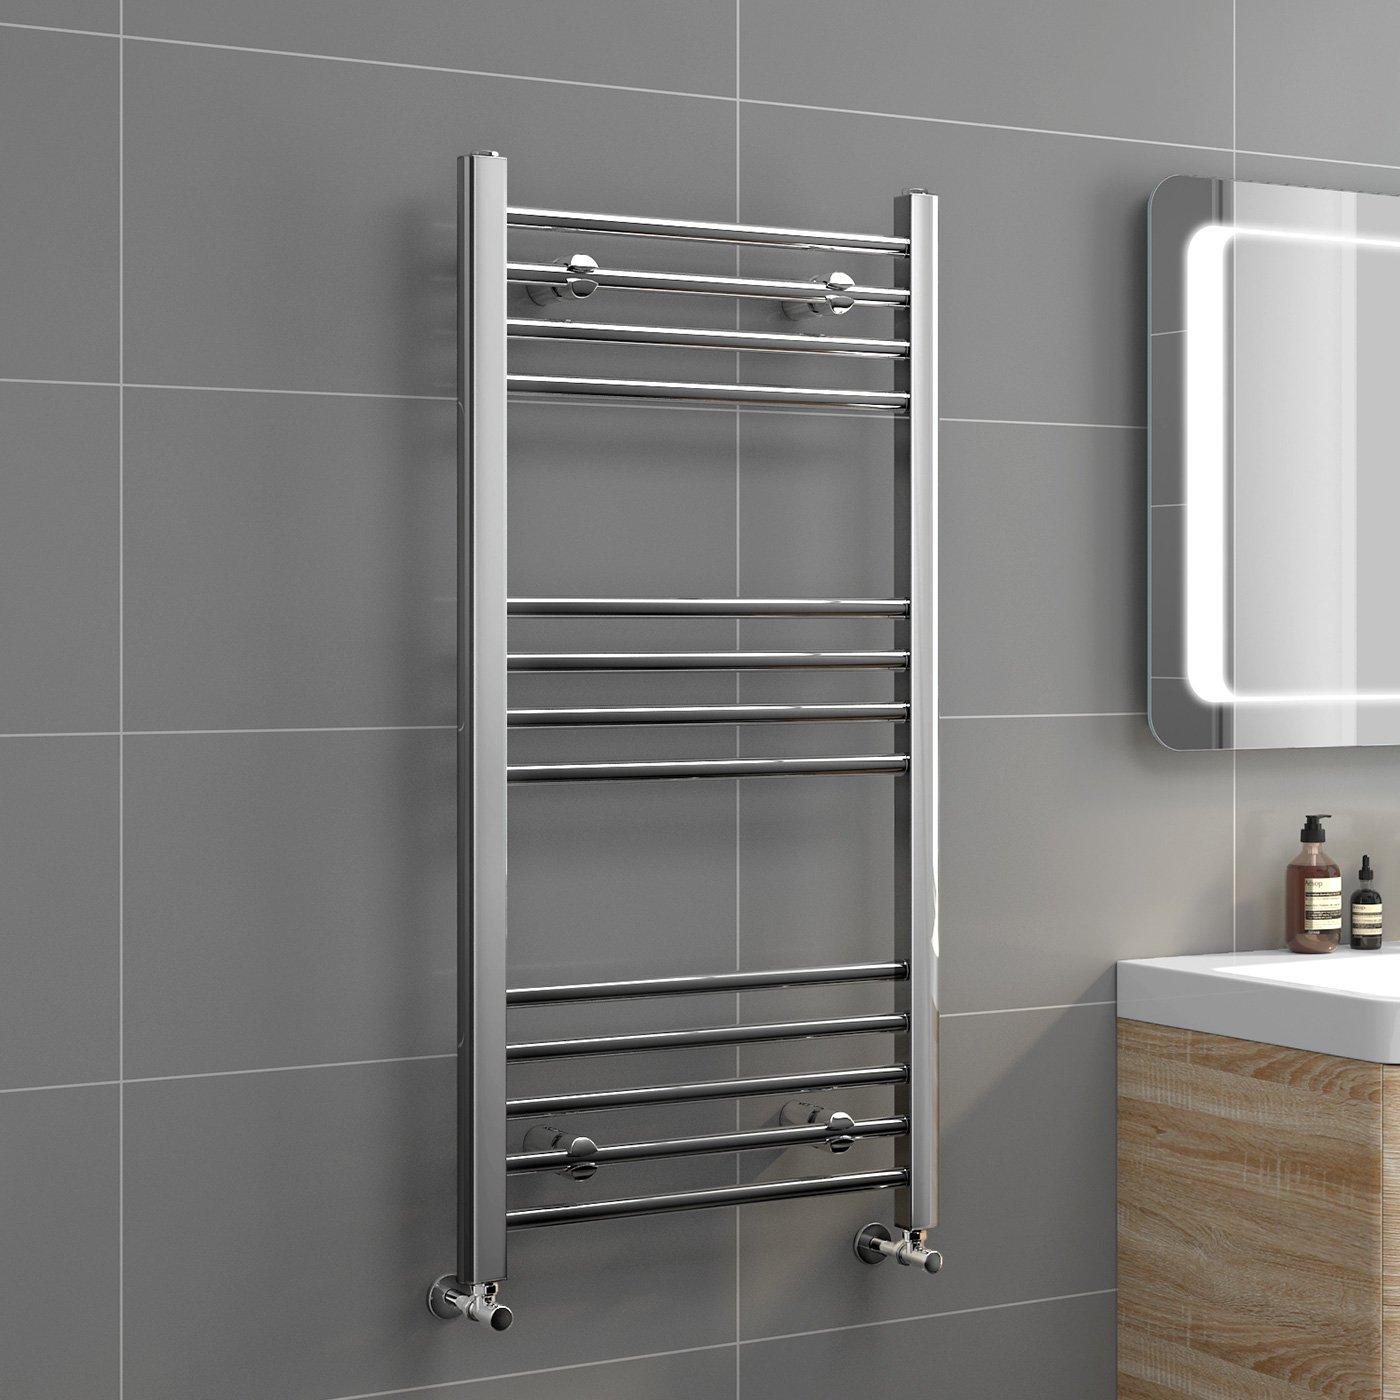 iBathUK 400 x 300 Straight Heated Towel Rail Chrome Bathroom Radiator - All Sizes